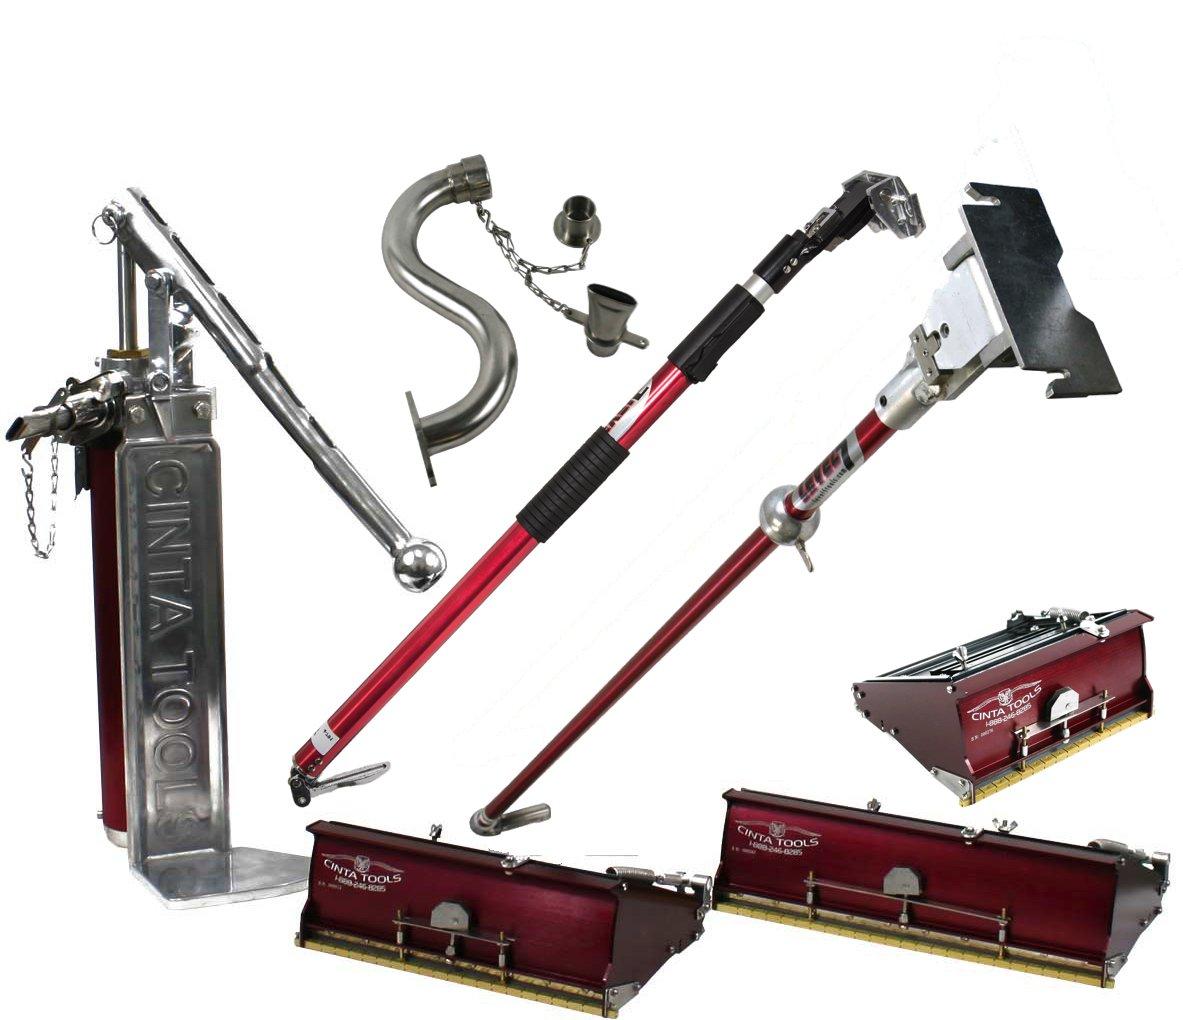 Cinta 7/10/12 Drywall Triple Flat Box Set with Pump, Extender Handle, 42'' Handle, High Reach Box Filler by Cinta